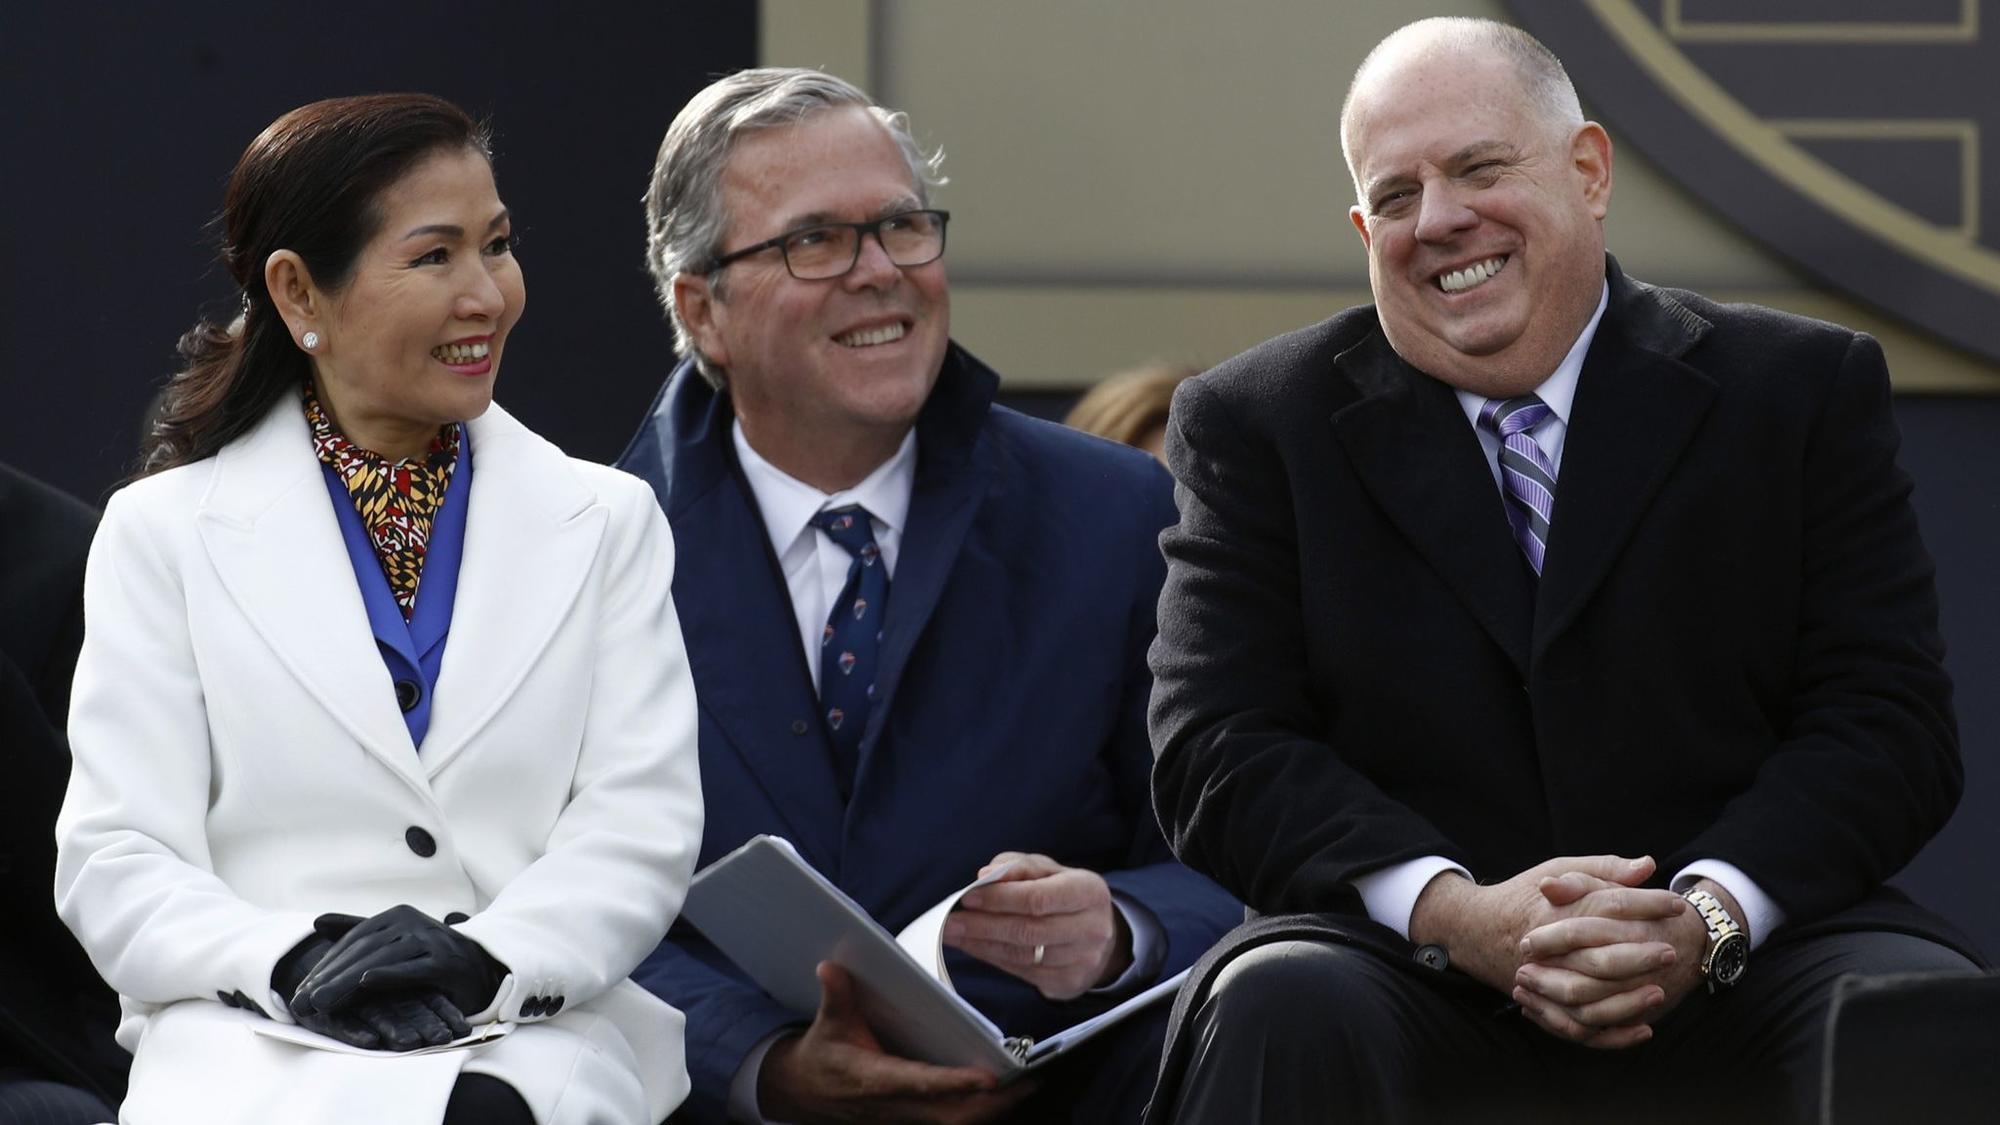 Washington think tank president wooing Maryland Gov. Hogan to run against Trump for president